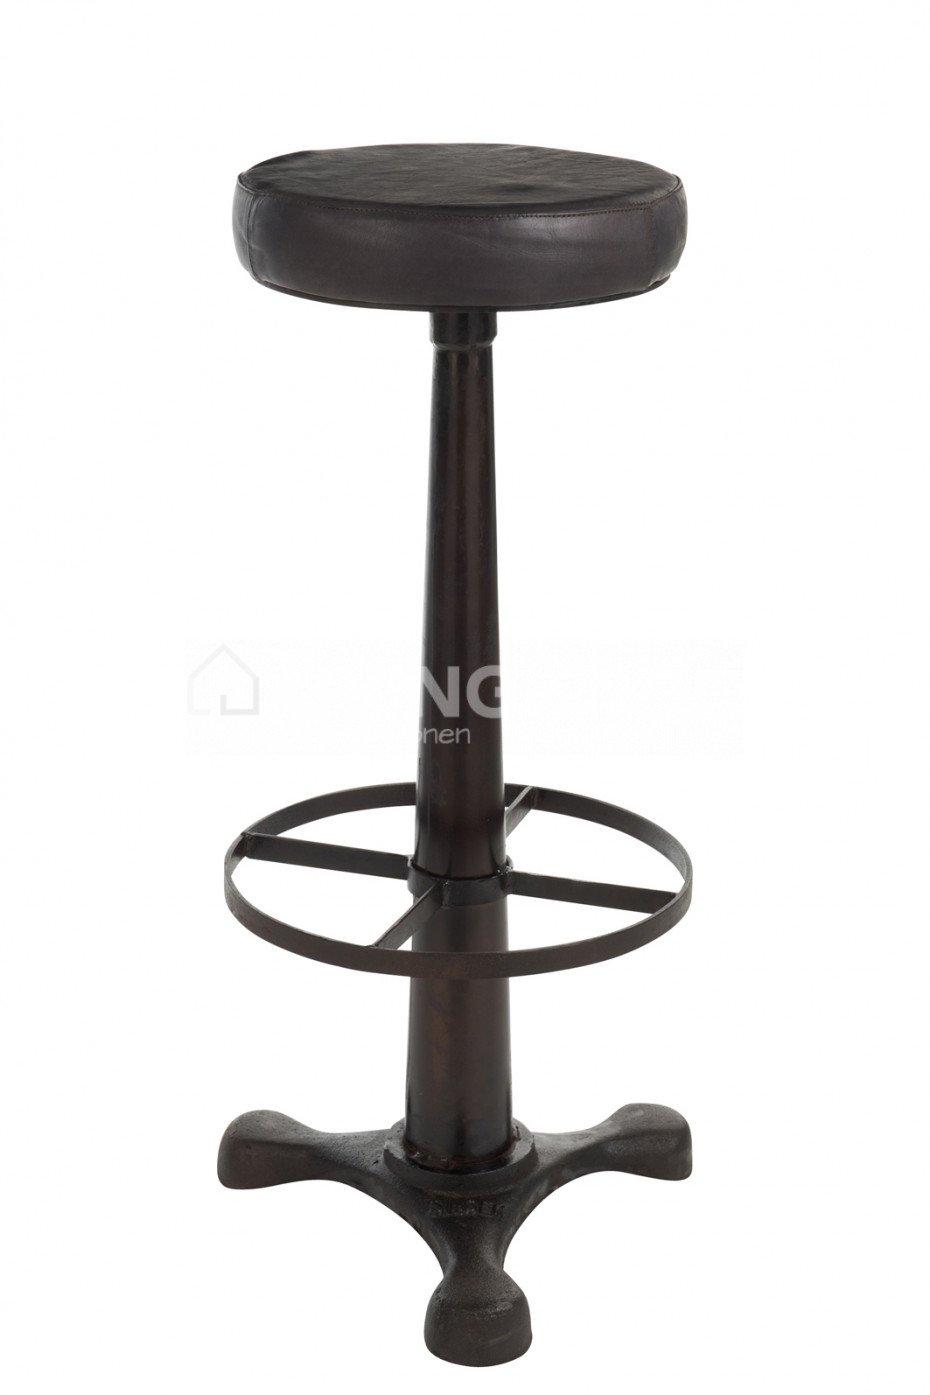 Awe Inspiring Black Leather Bar Stools Metal Black To Buy Online J Line Creativecarmelina Interior Chair Design Creativecarmelinacom